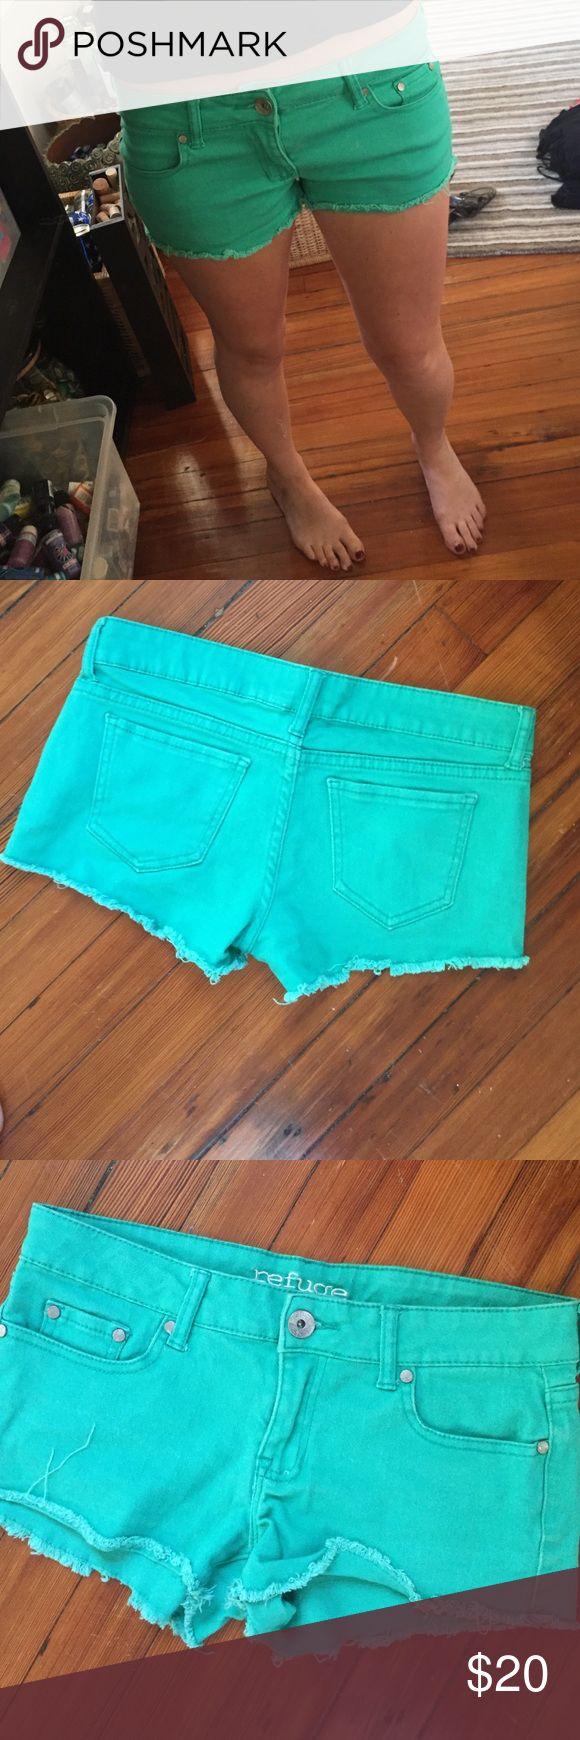 Daisy duke shorts Frayed colored daisy duke shorts Charlotte Russe Shorts Jean Shorts